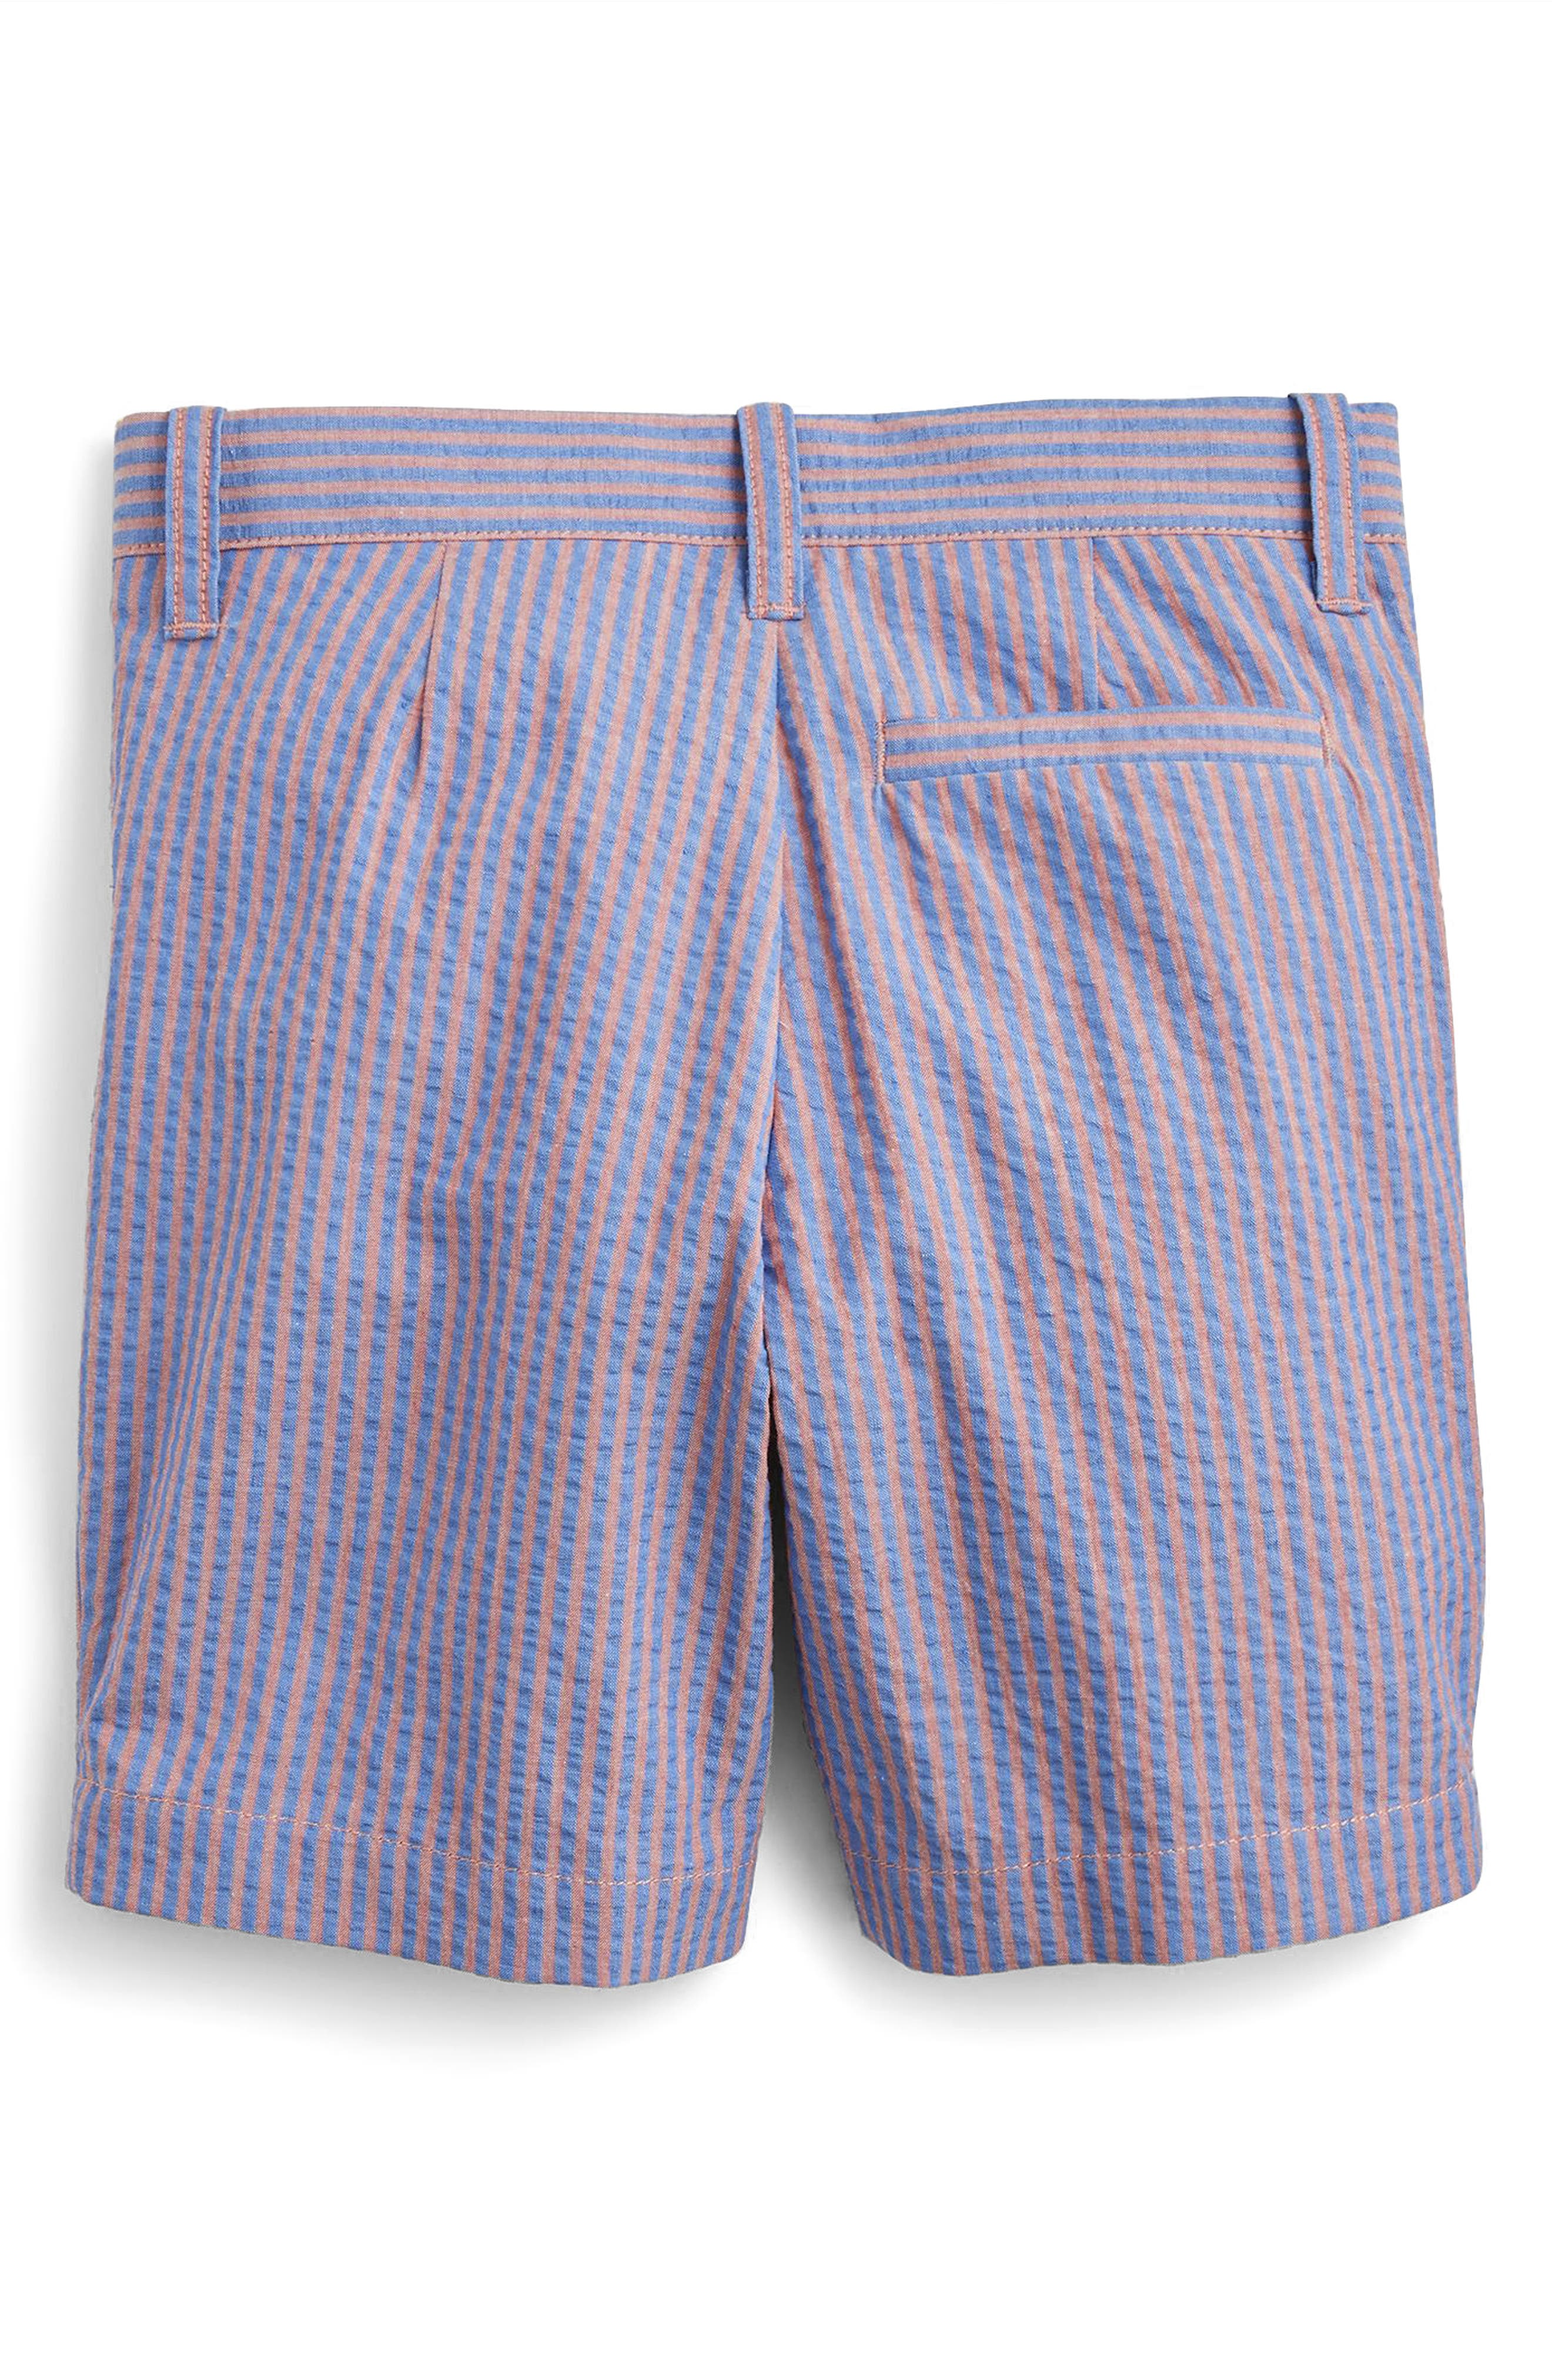 Stanton Seersucker Shorts,                             Alternate thumbnail 2, color,                             600